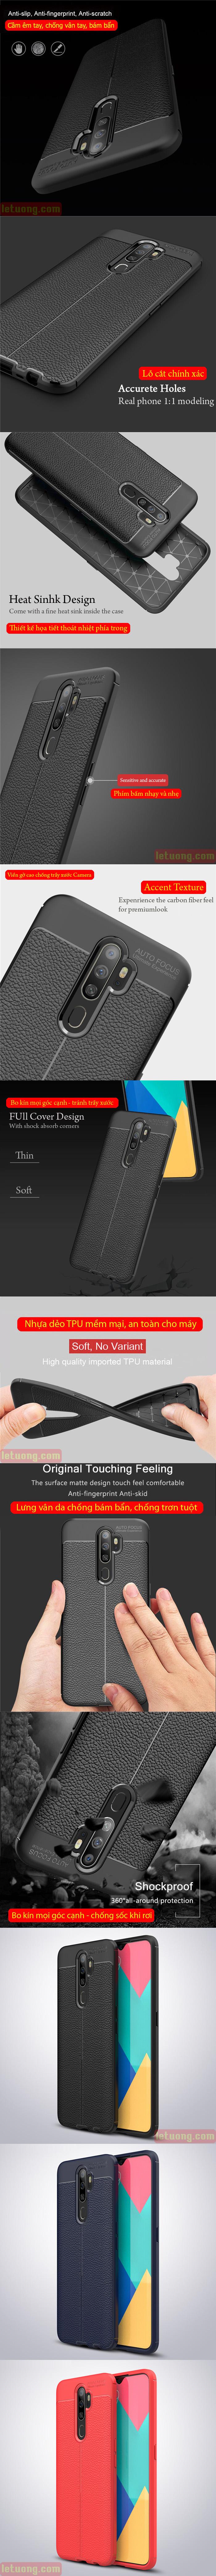 Ốp lưng Oppo A9 2020 LT Leather Design Case vân da - sang trọng 4